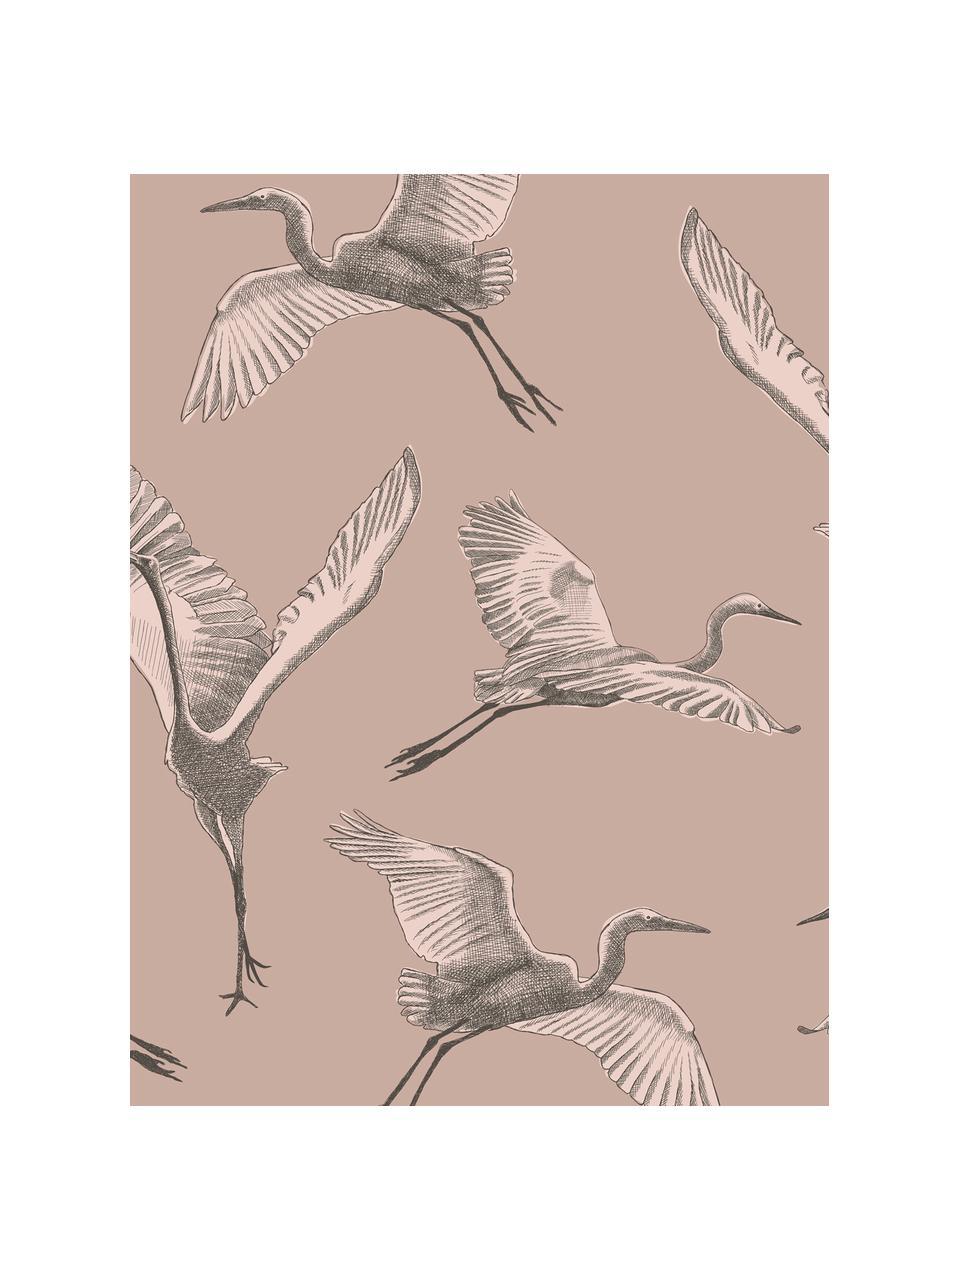 Adesivo murale Graphic Nature, Tessuto non tessuto, Rosa, beige, grigio, Larg. 300 x Alt. 280 cm